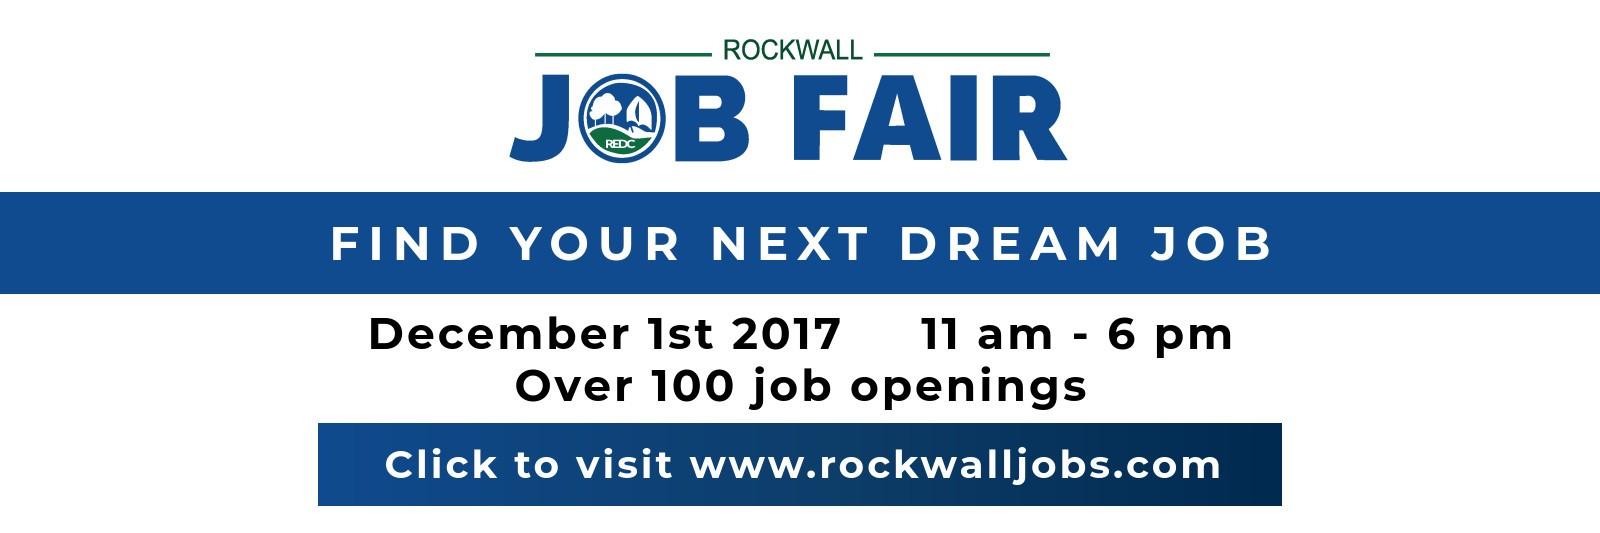 job-fair-web-banner.jpg